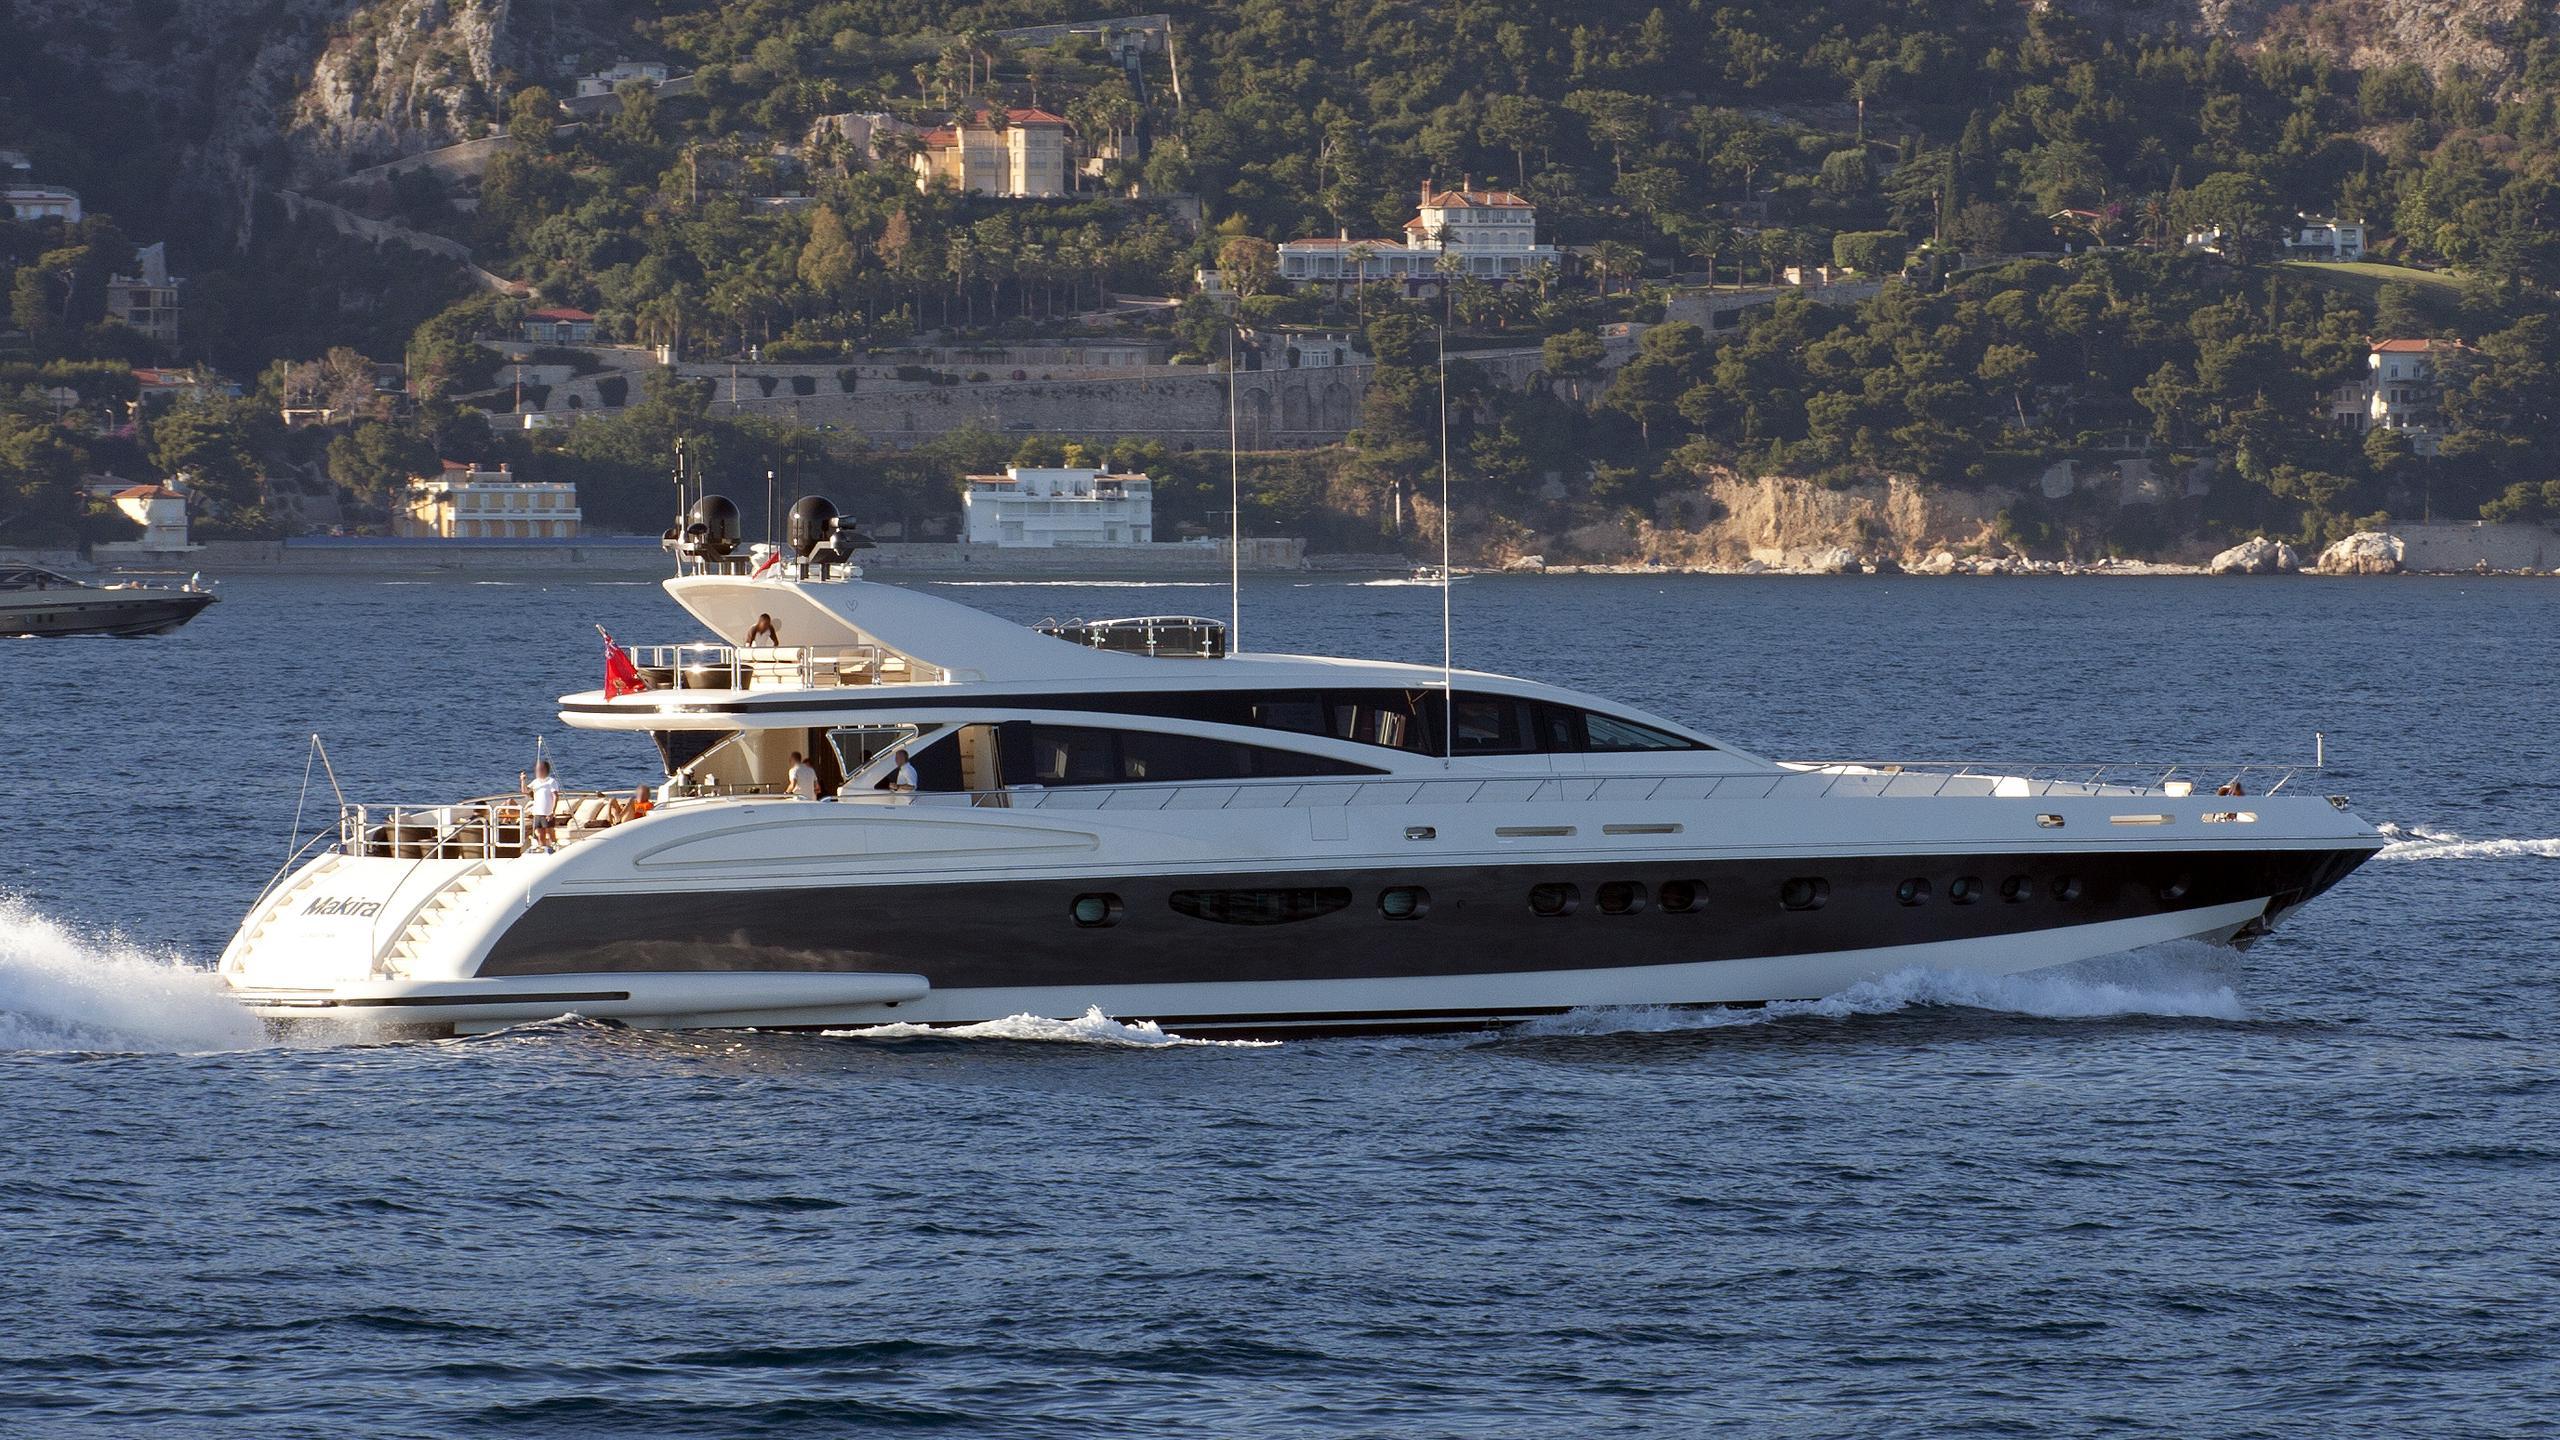 antelope-iii-yacht-exterior